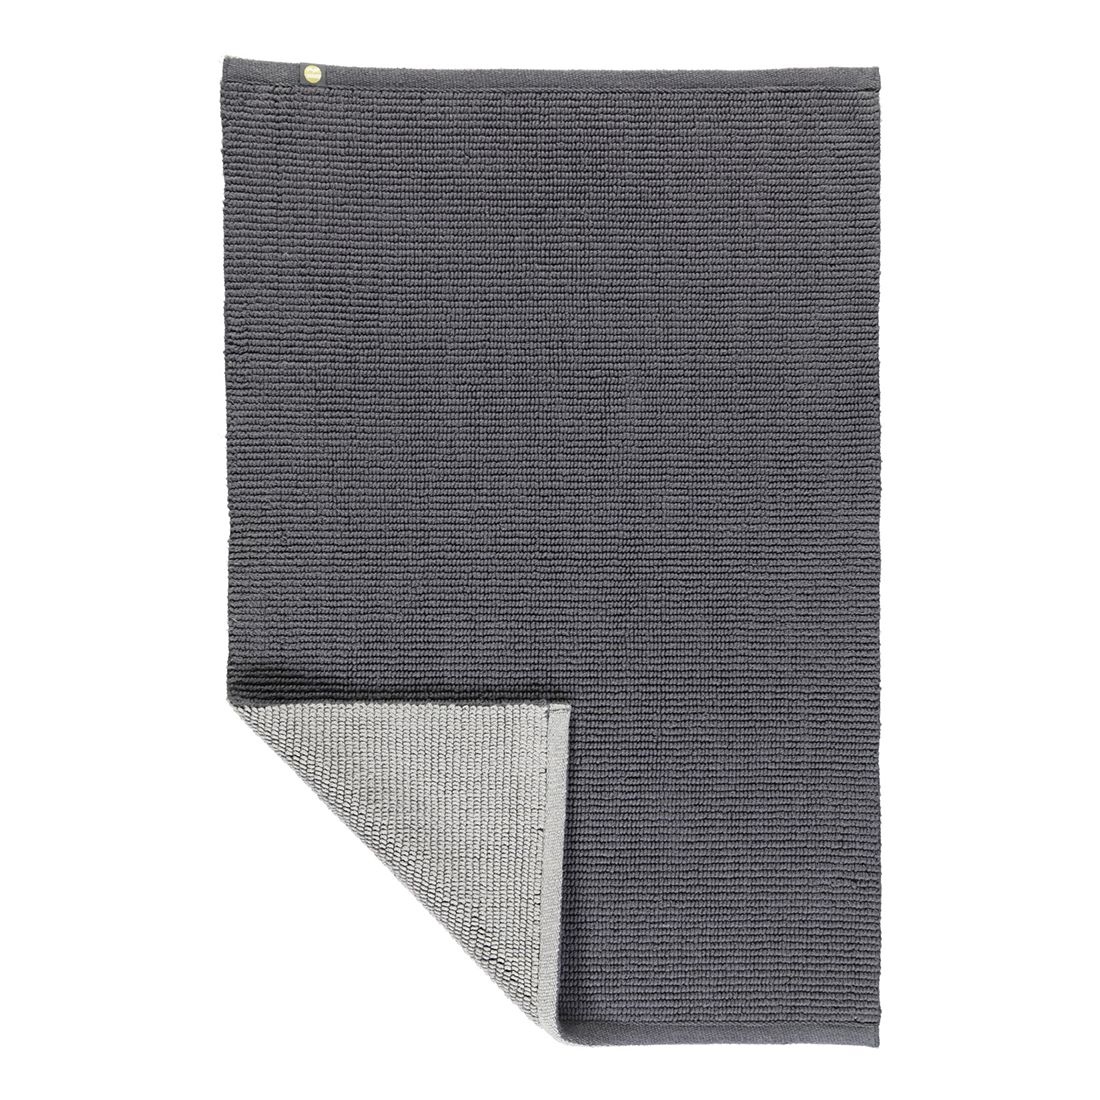 Badteppich Double – 100% Baumwolle zinn/kiesel – 1157 – Abmessungen: 60 x 90 cm, Rhomtuft online bestellen